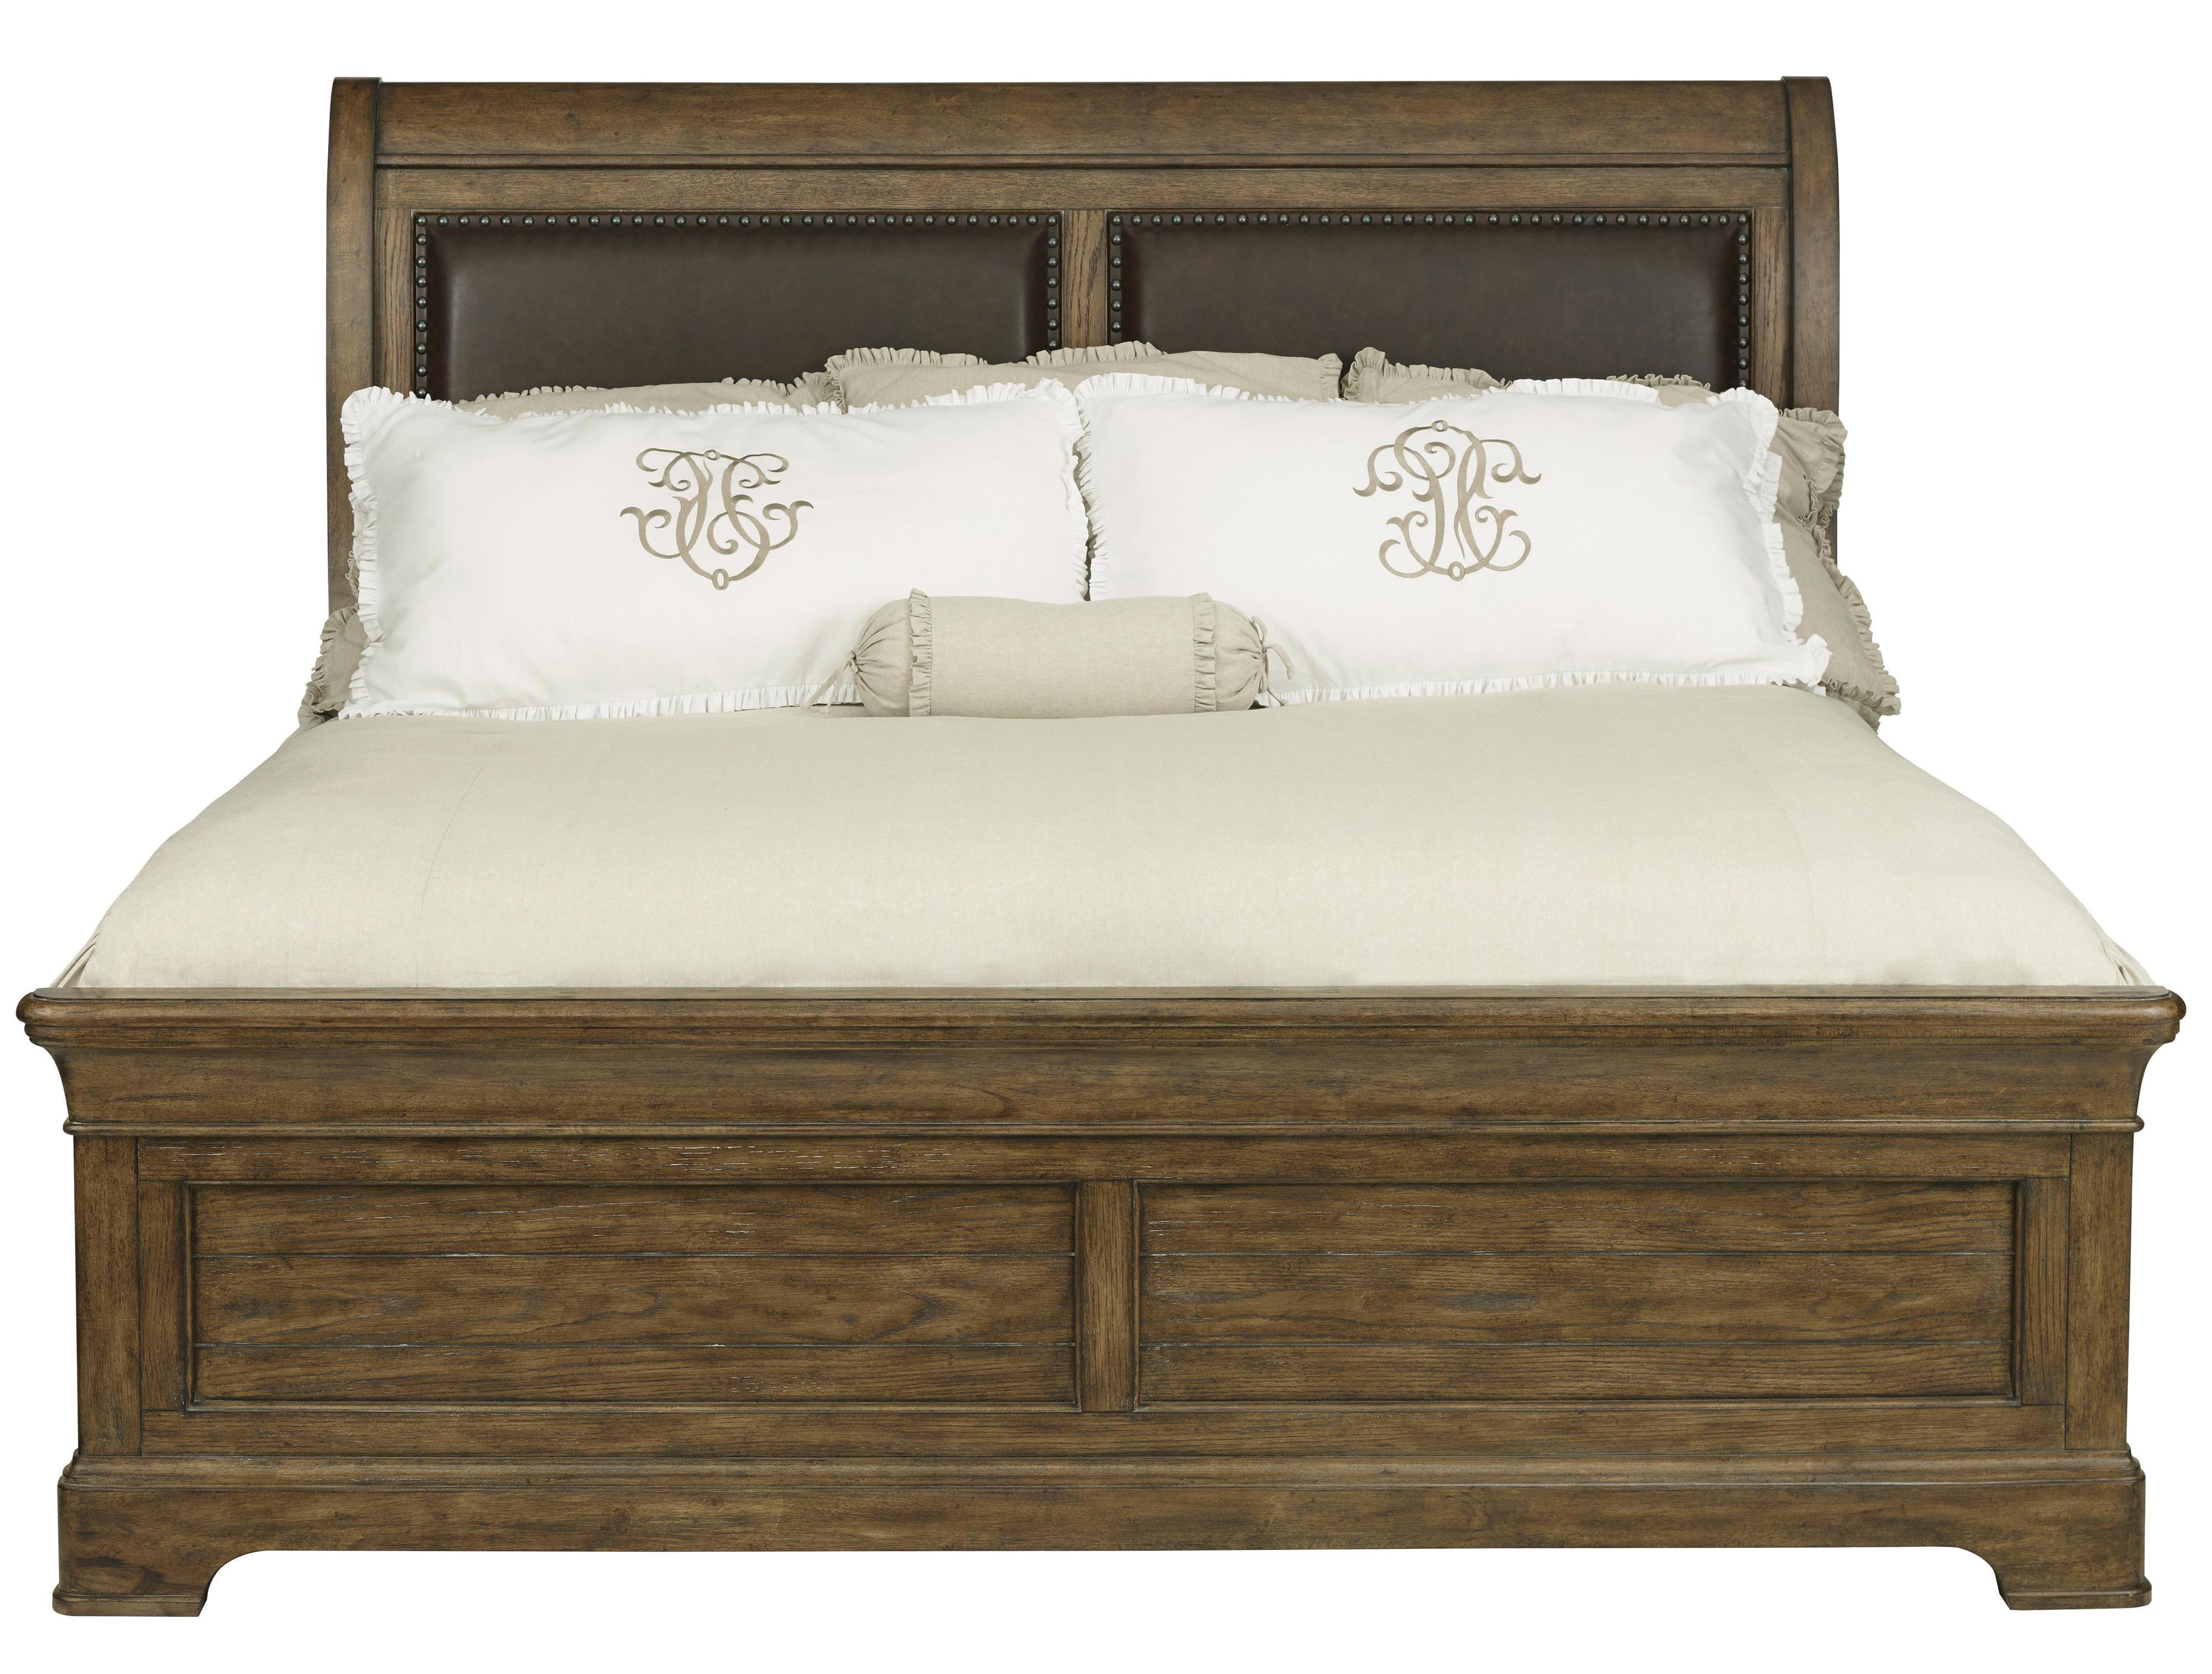 Belfort Select Virginia Mill Queen Sleigh Upholstered Bed - Item Number: 8854-254+251+400